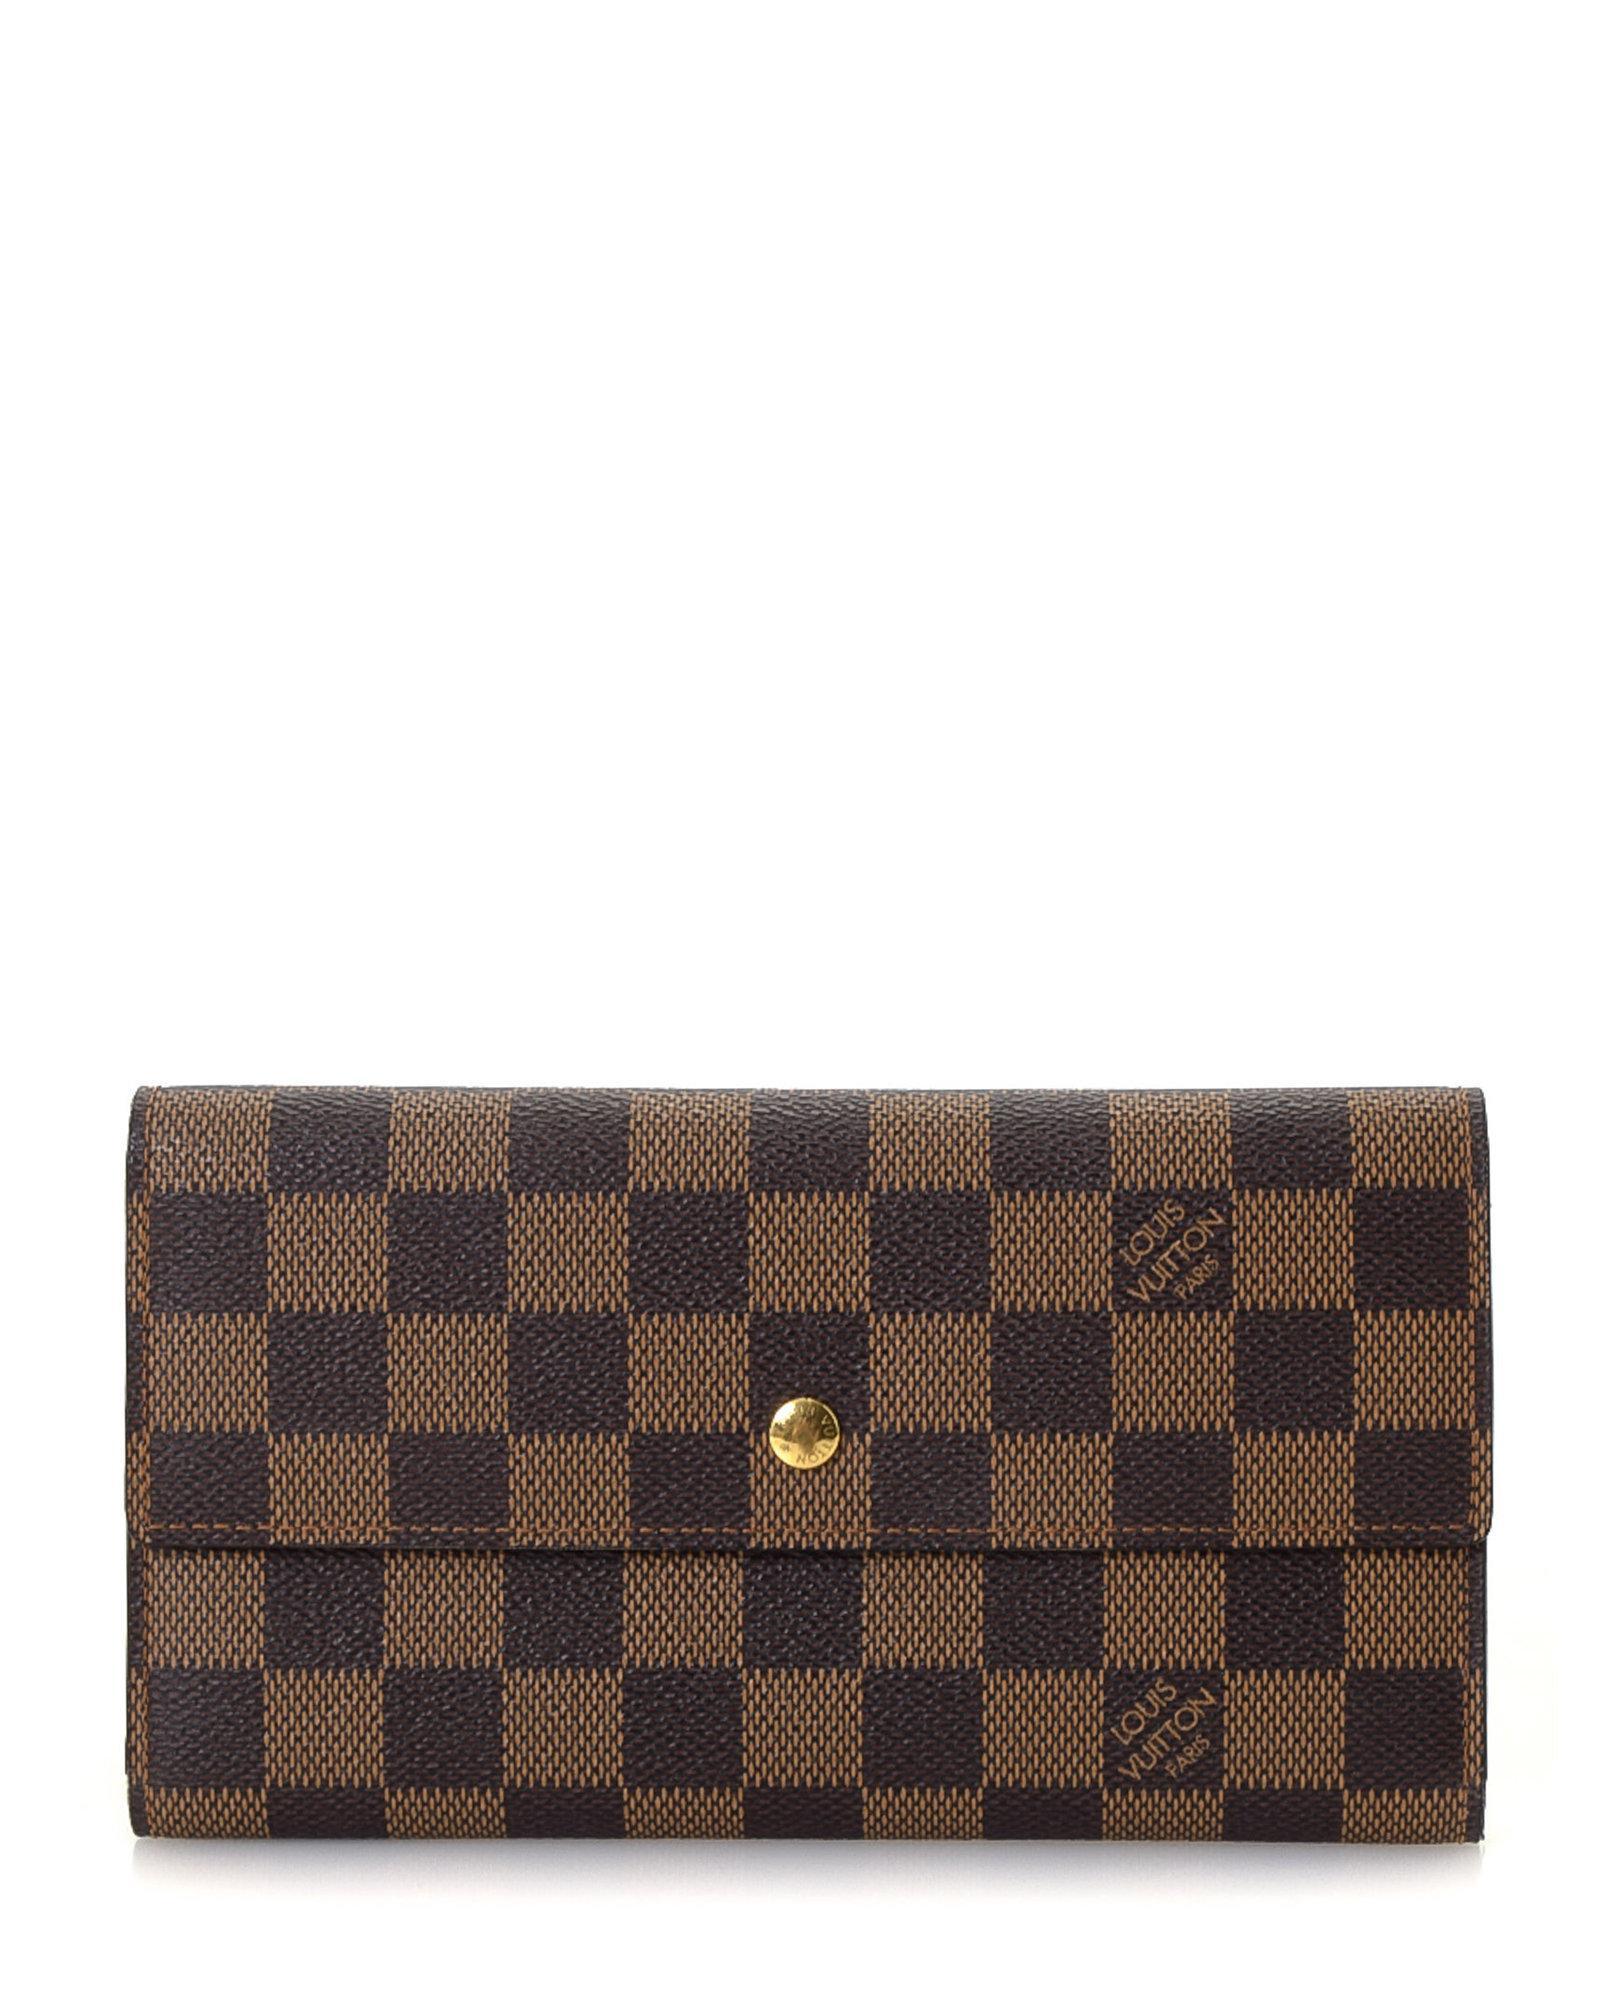 76b6c30f6256a Lyst - Louis Vuitton Porte-tresor International Wallet - Vintage in ...